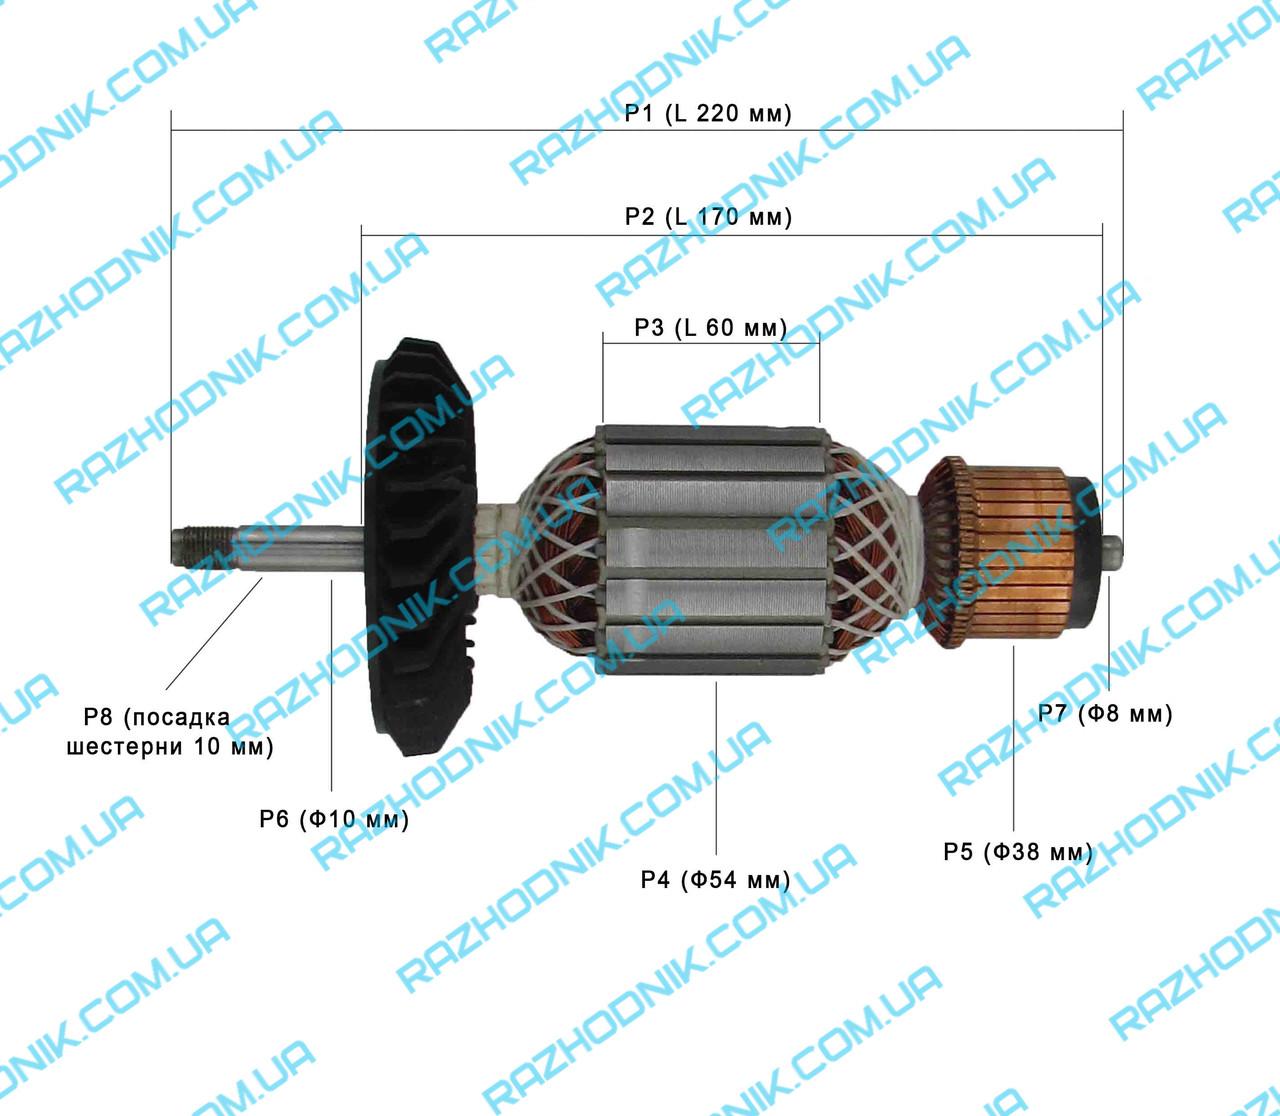 Якорь на болгарку Bosch GWS 24-230 (Аналог)